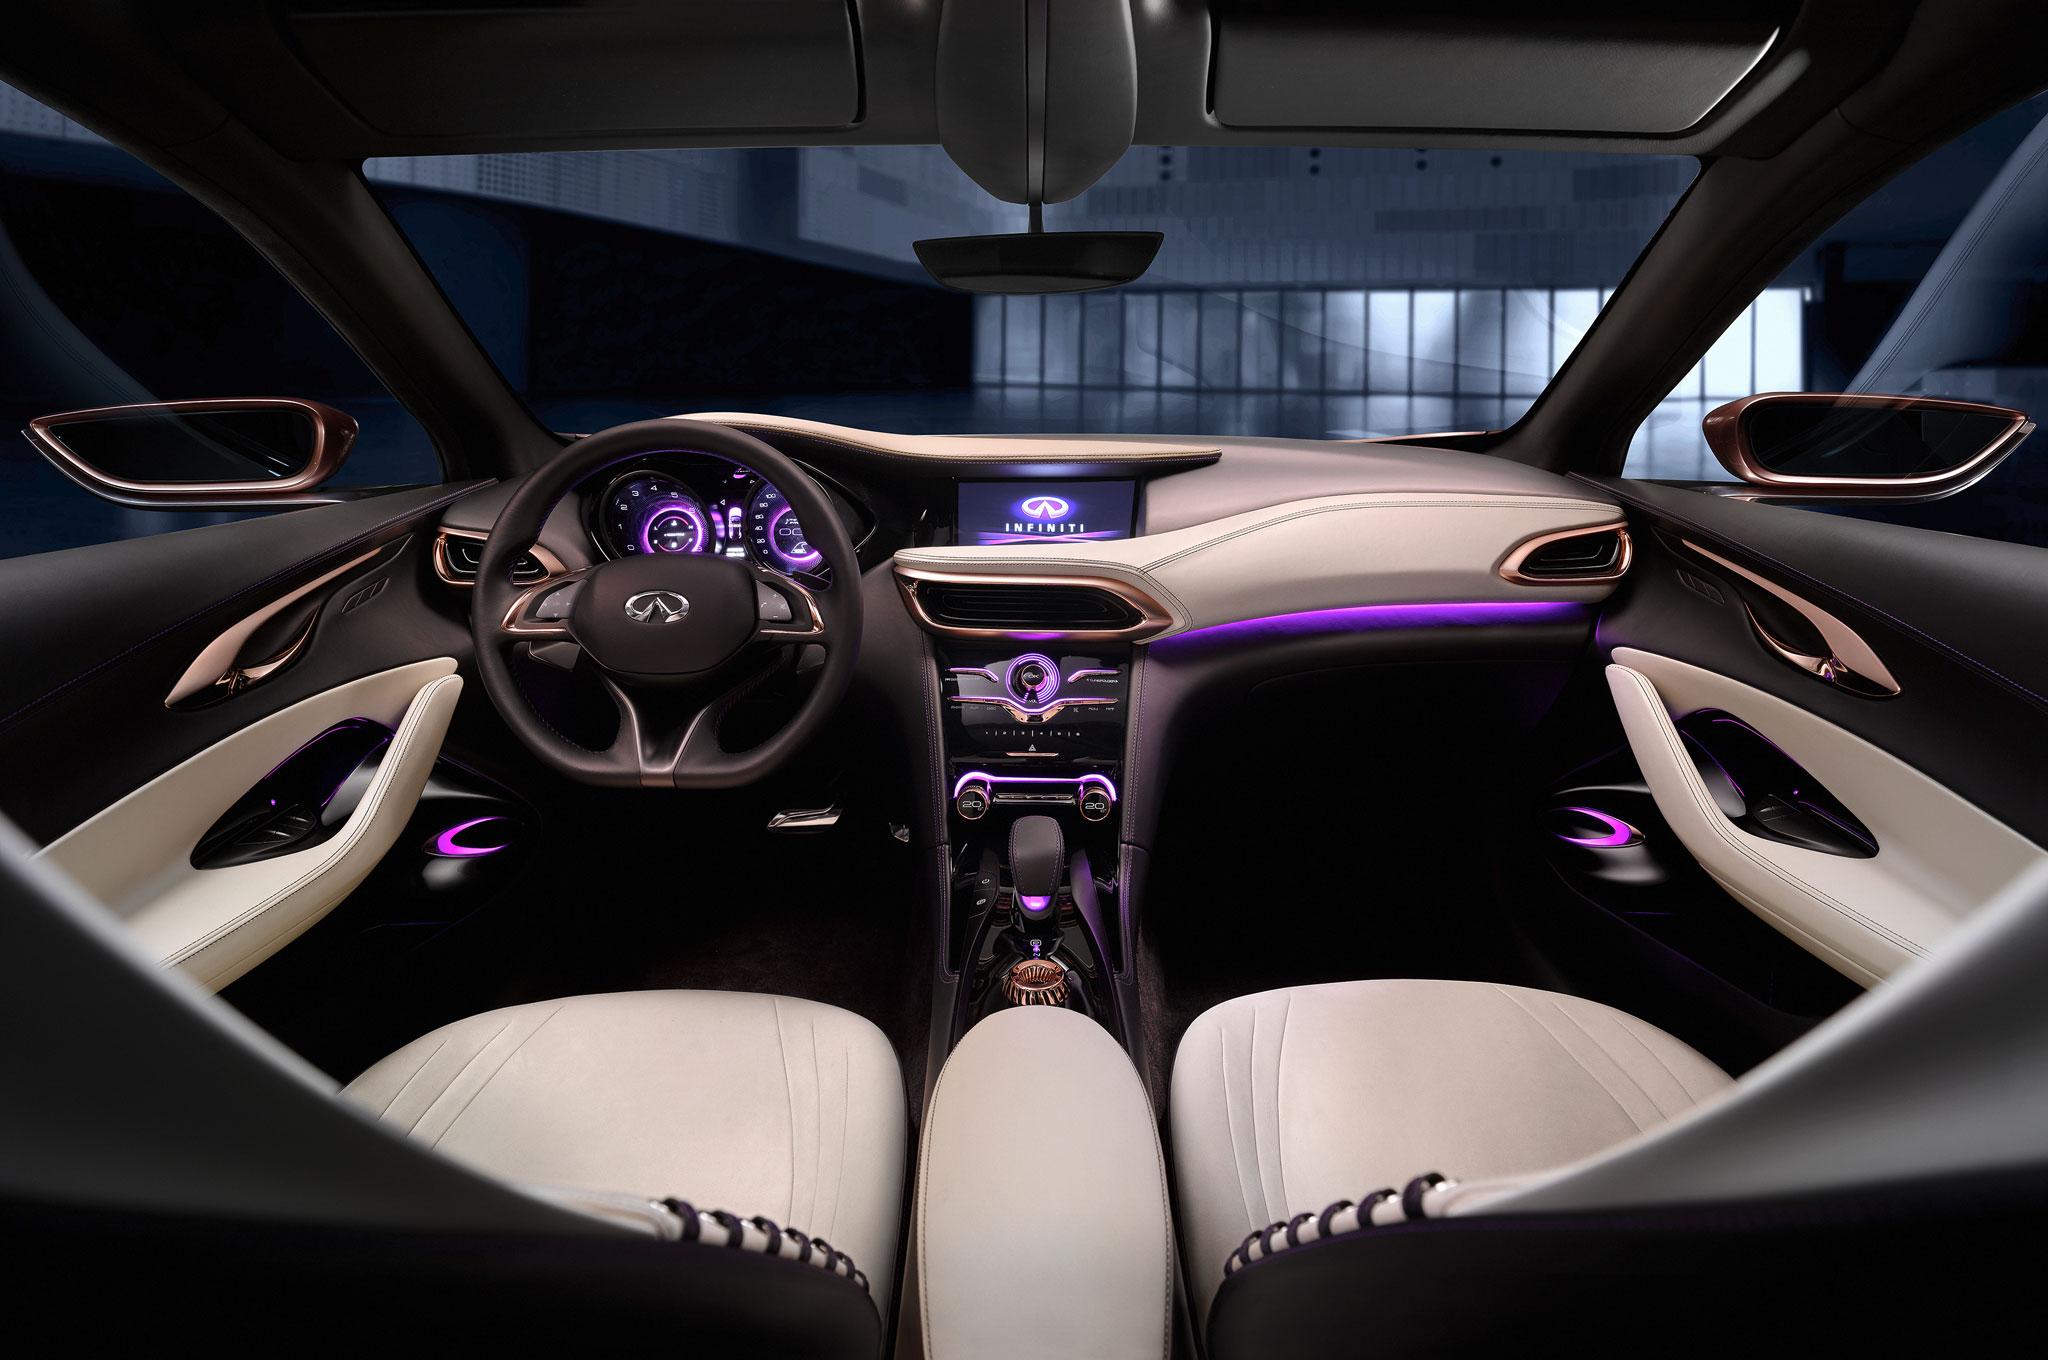 2017 BMW M9 Interior Concept 1256 X 755 · The .